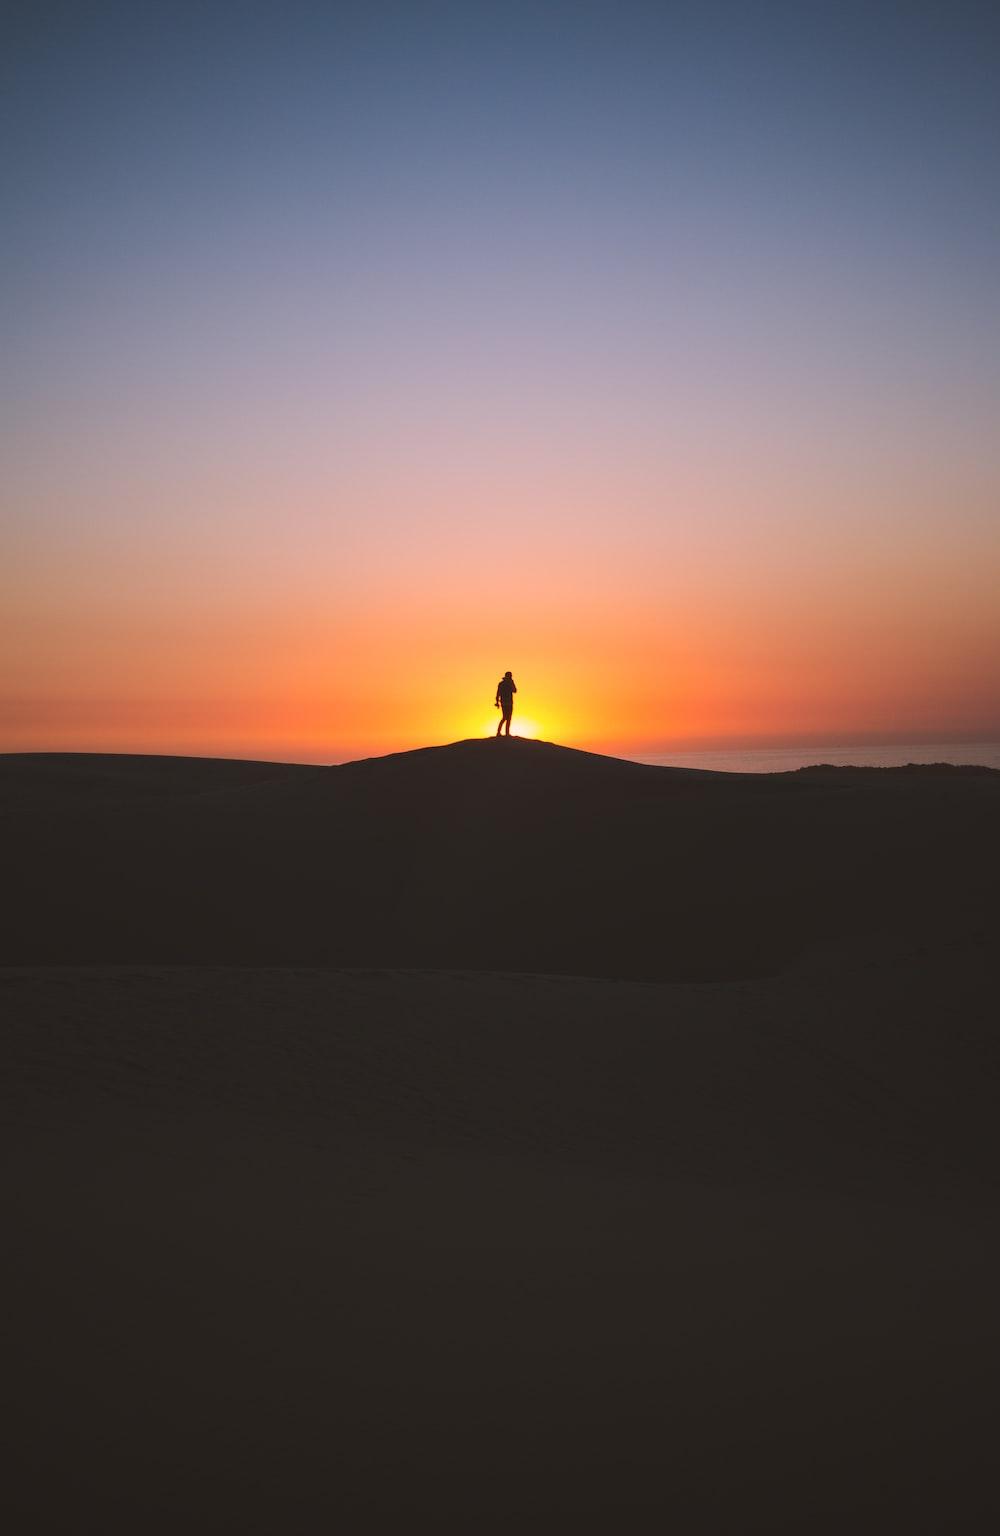 sunrise pictures stunning download free images on unsplash